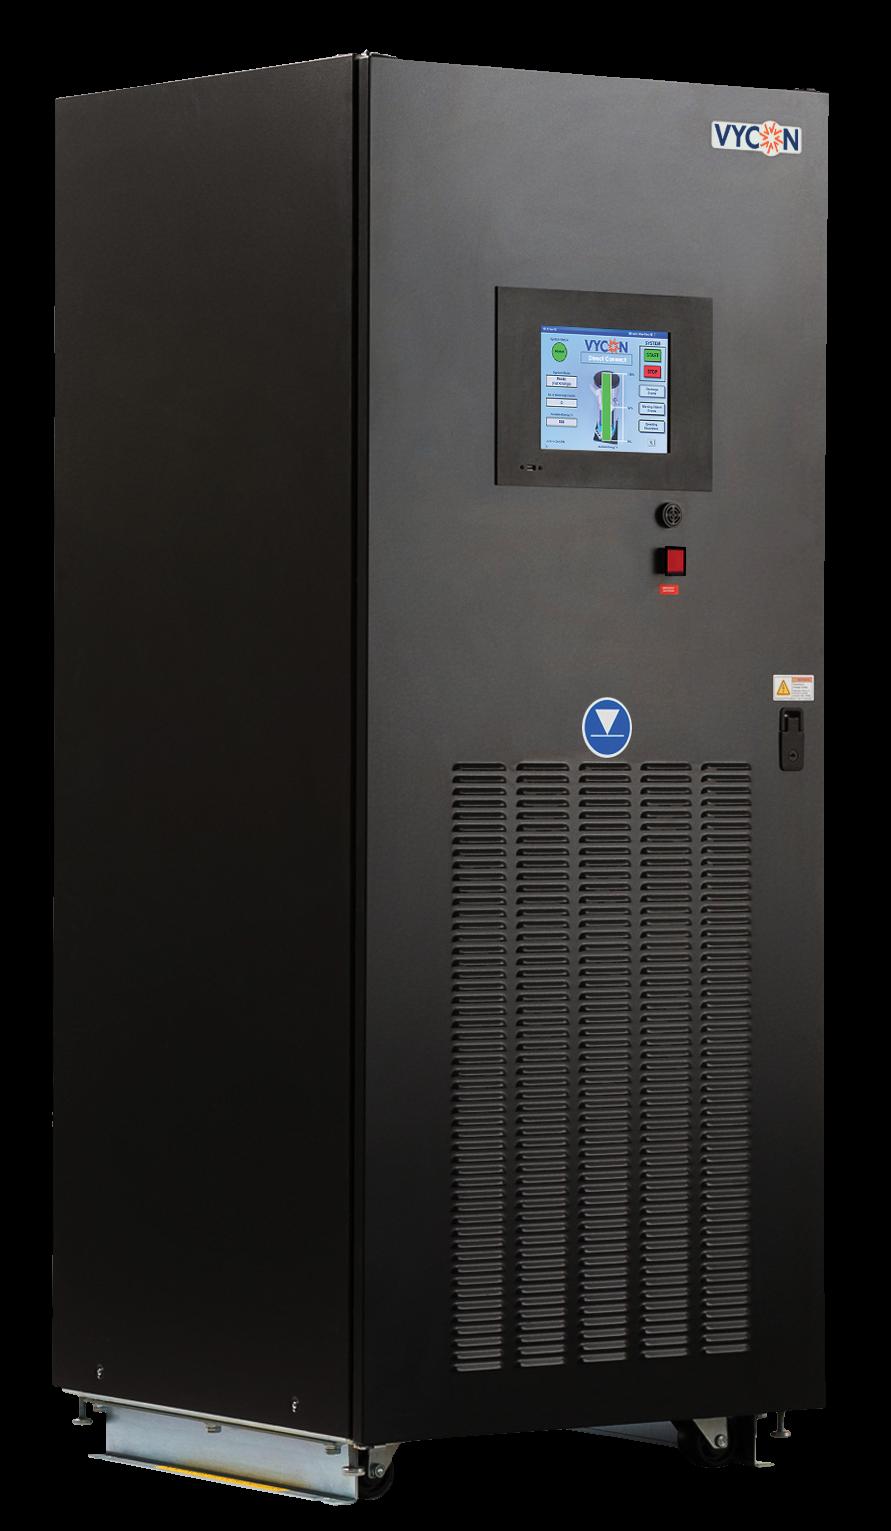 Vycon Vdc Flywheel Power Solutions